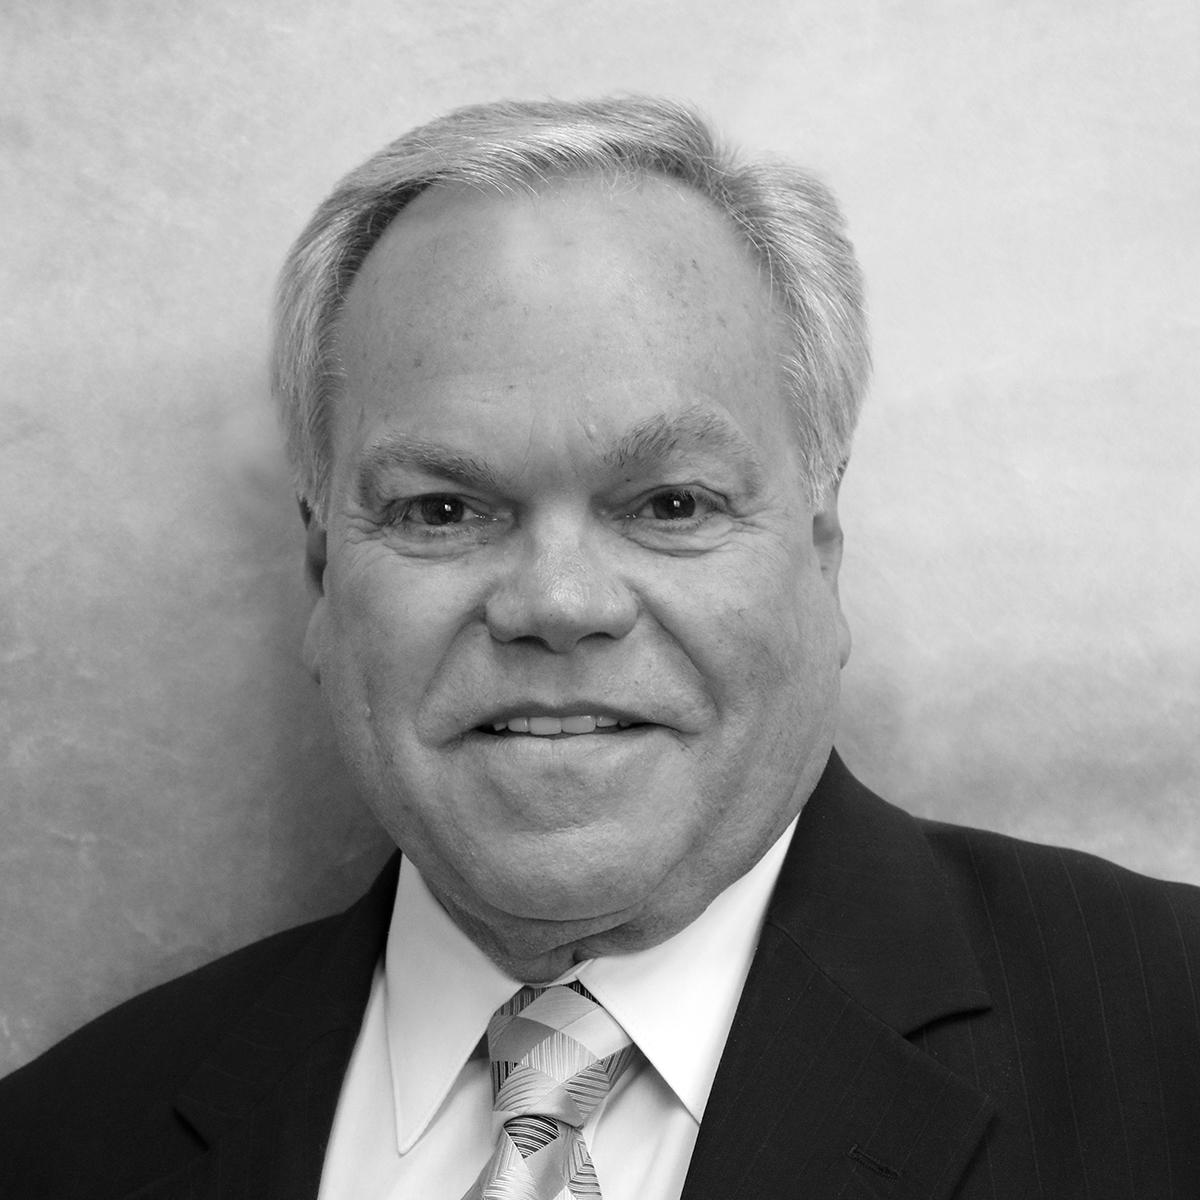 Dr. Walter C. Fluharty, Vice President of EHS & Organizational Development; Simon Roofing